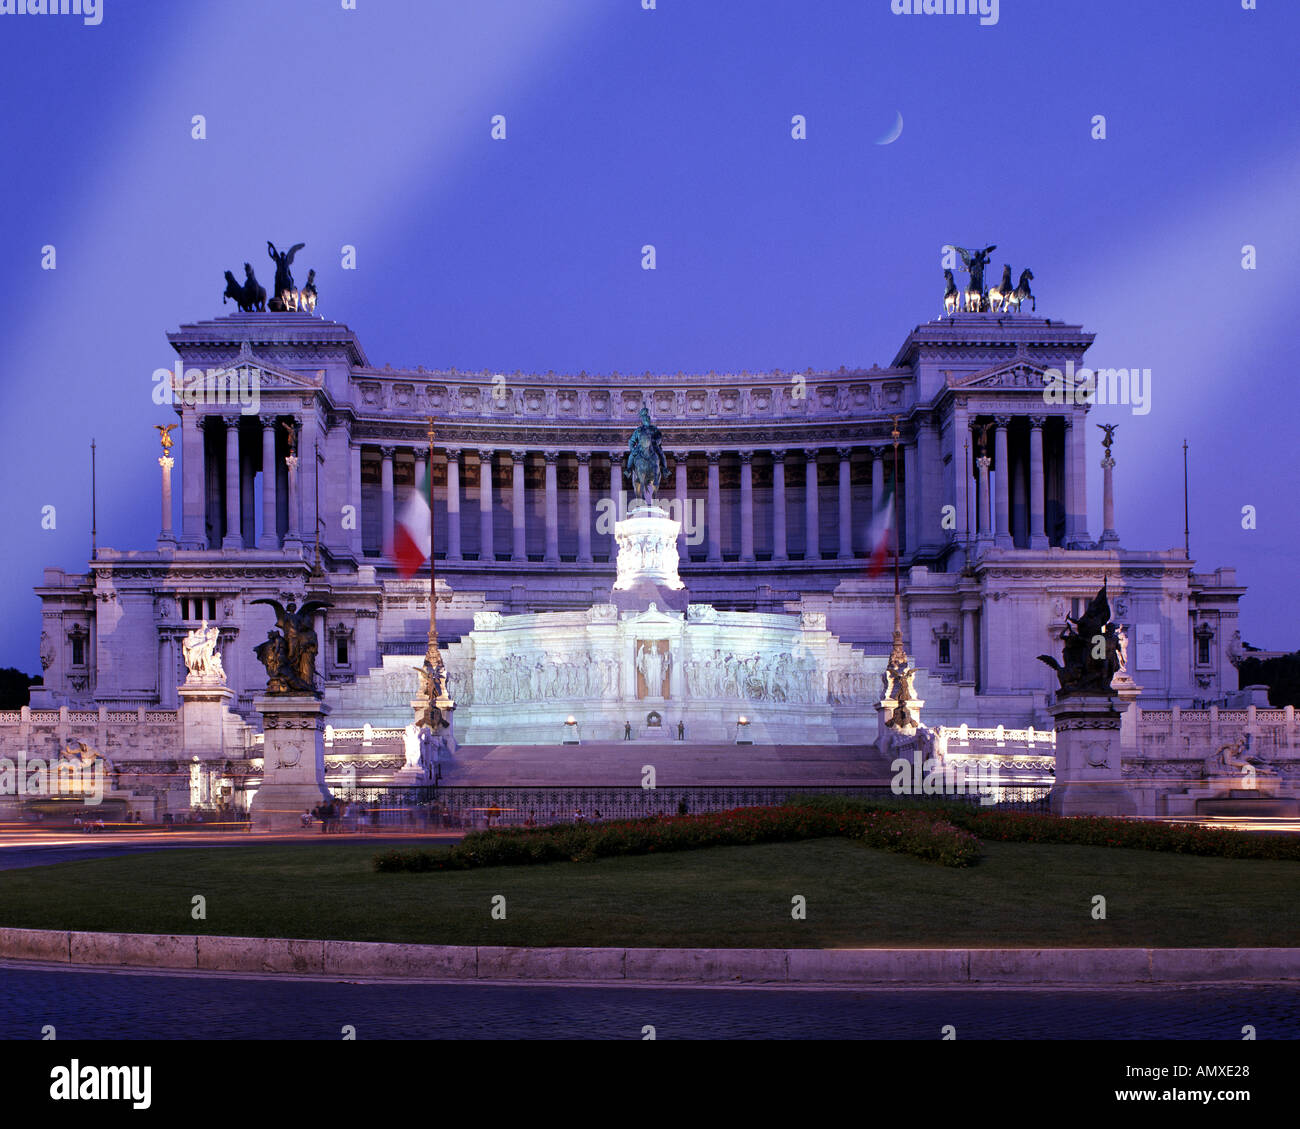 IT - ROME: Vittorio Emanuele II Monument by night - Stock Image